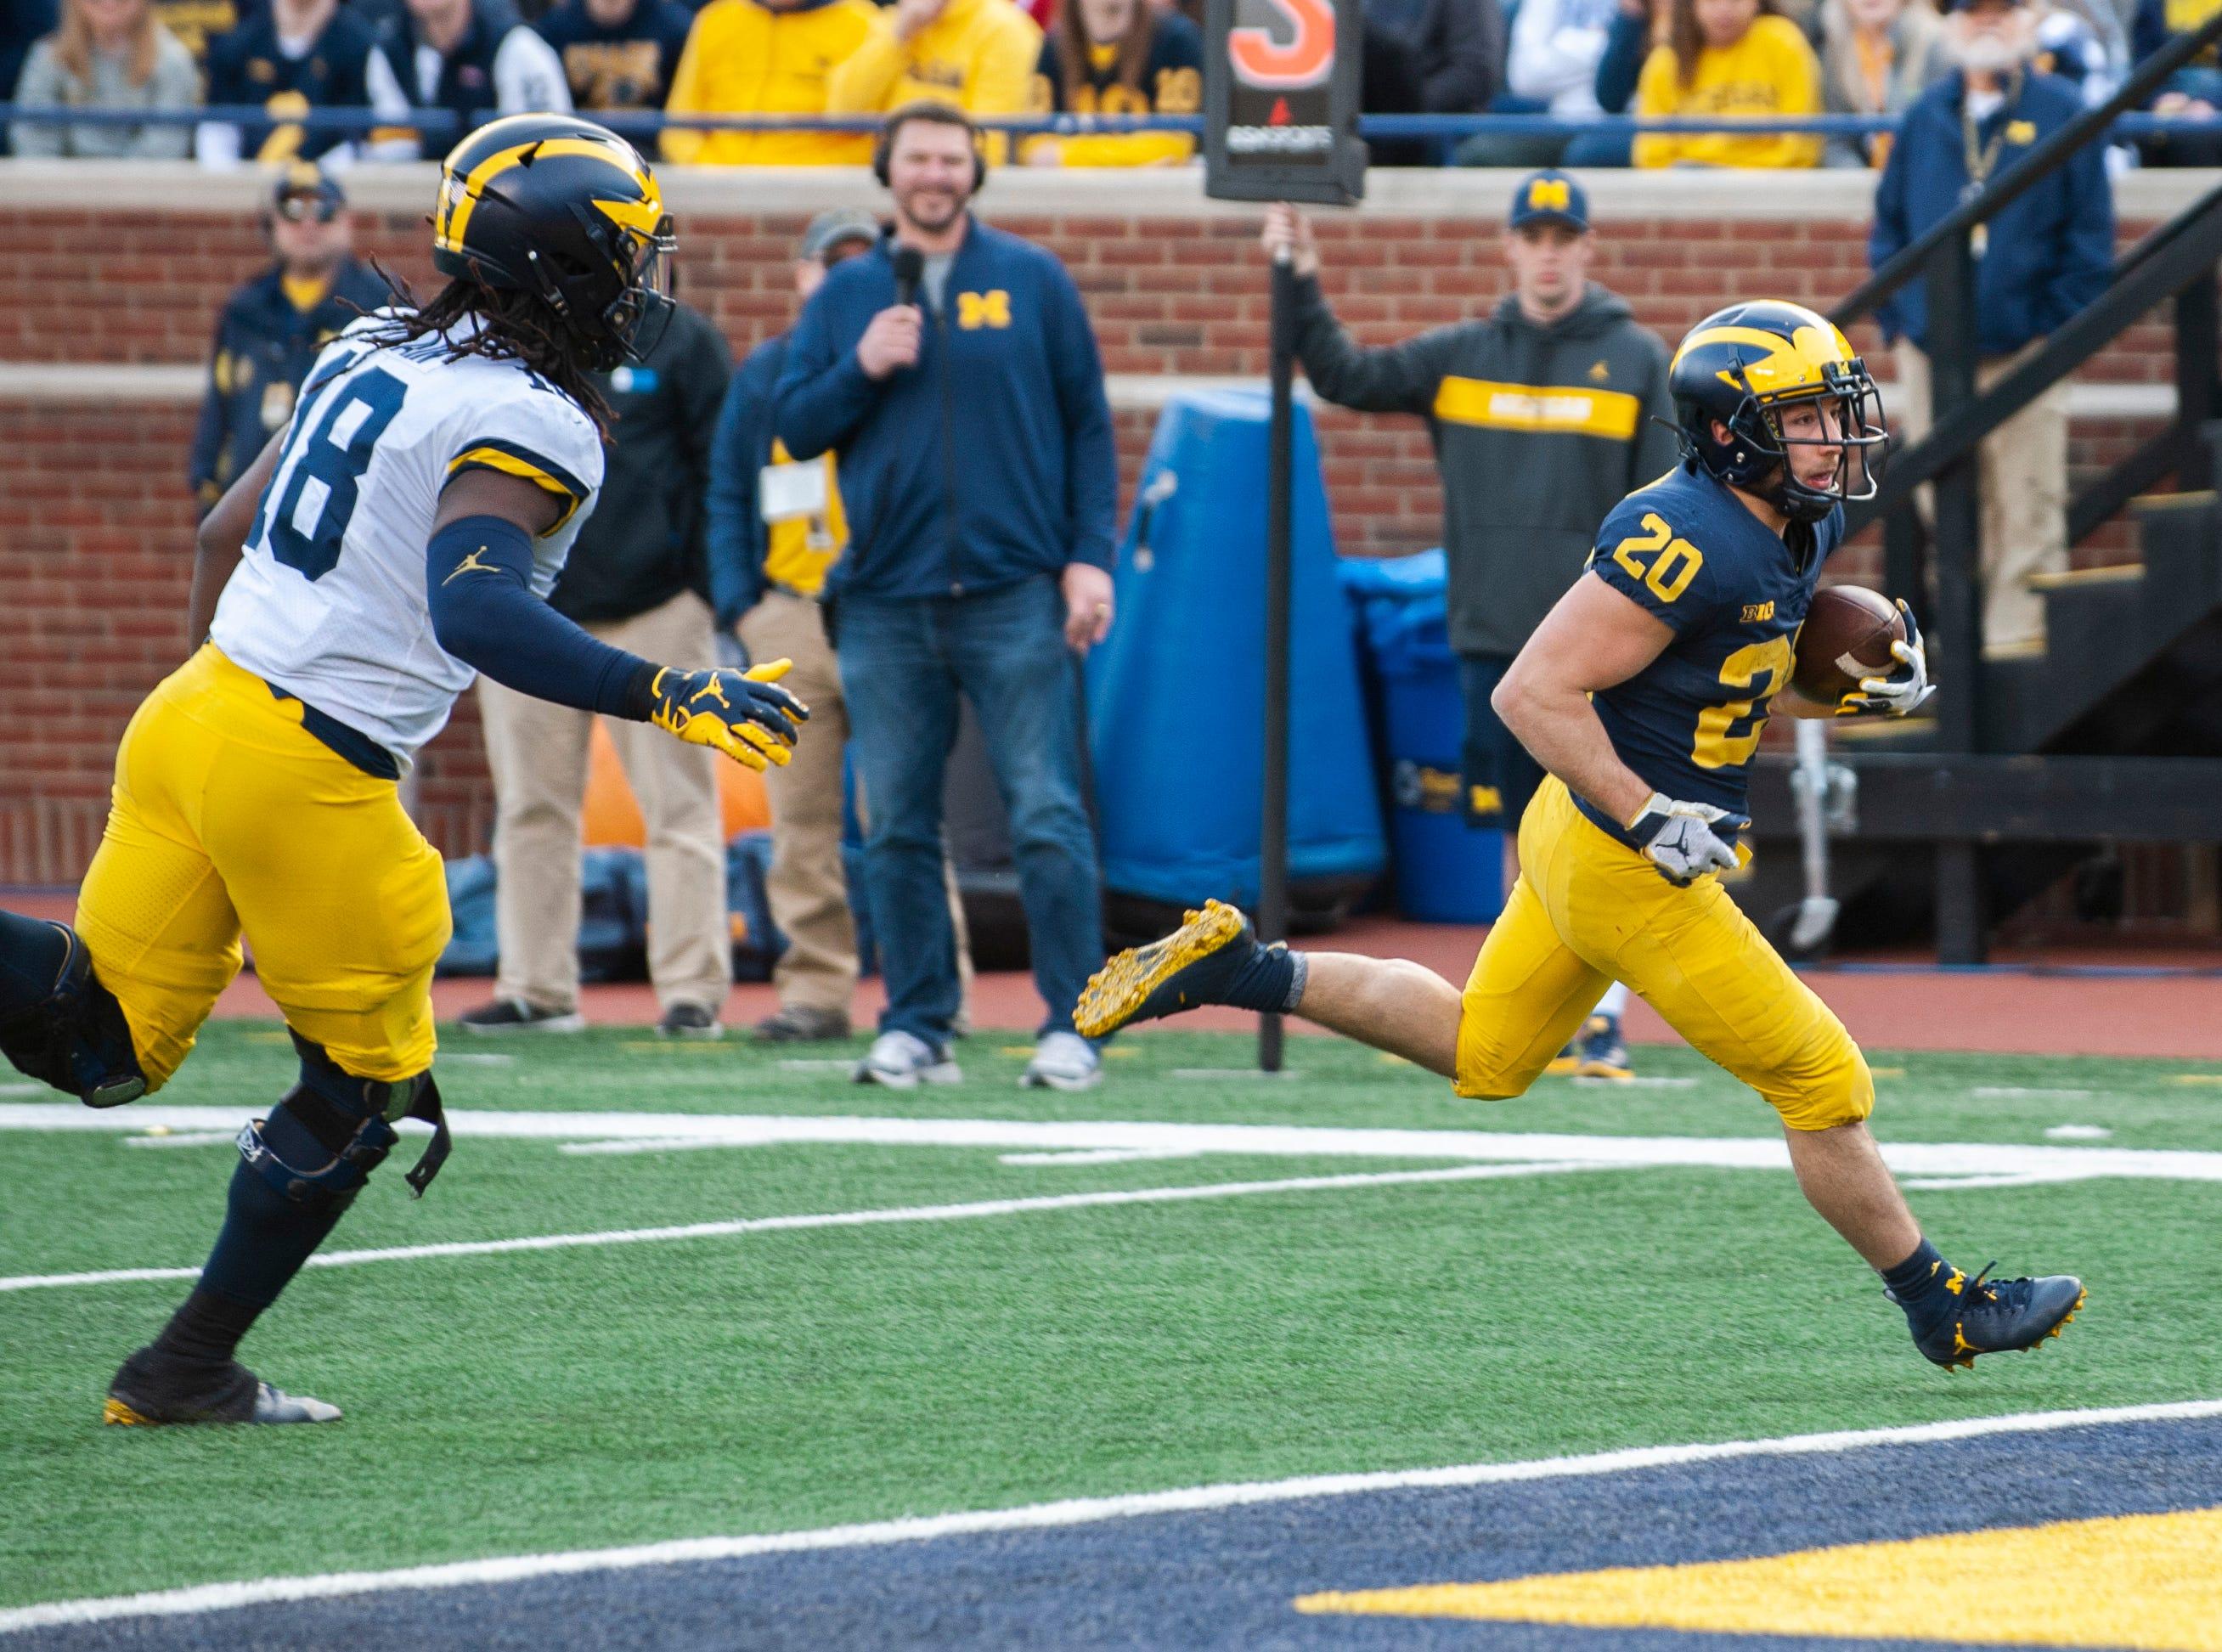 Michigan RB Nicholas Capatina scores a rushing touchdown.